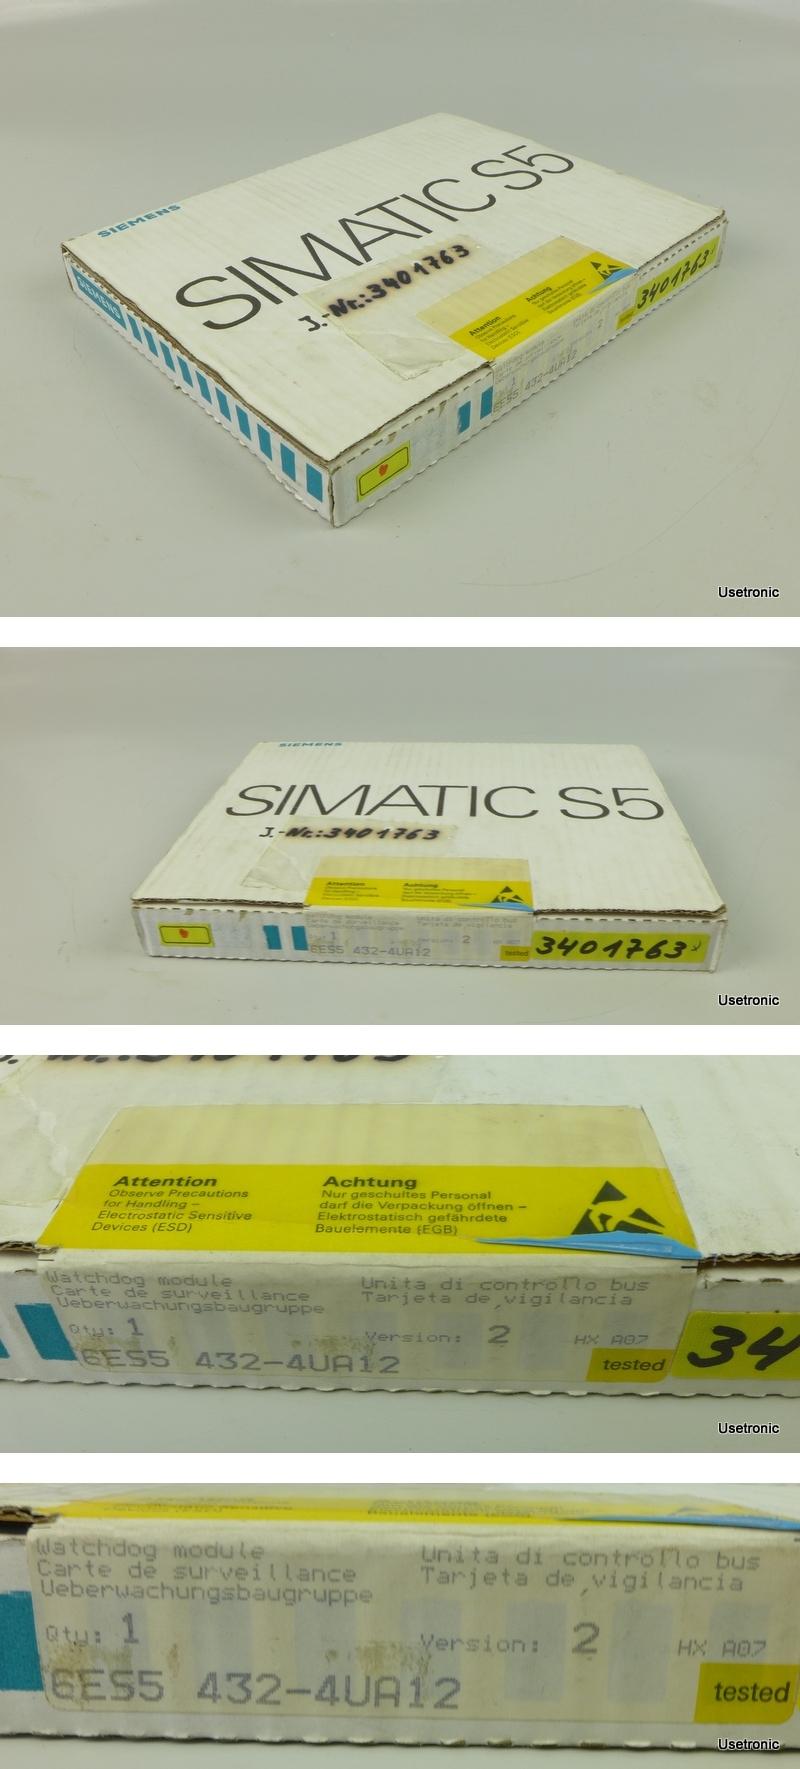 Siemens 6ES5432-4UA12